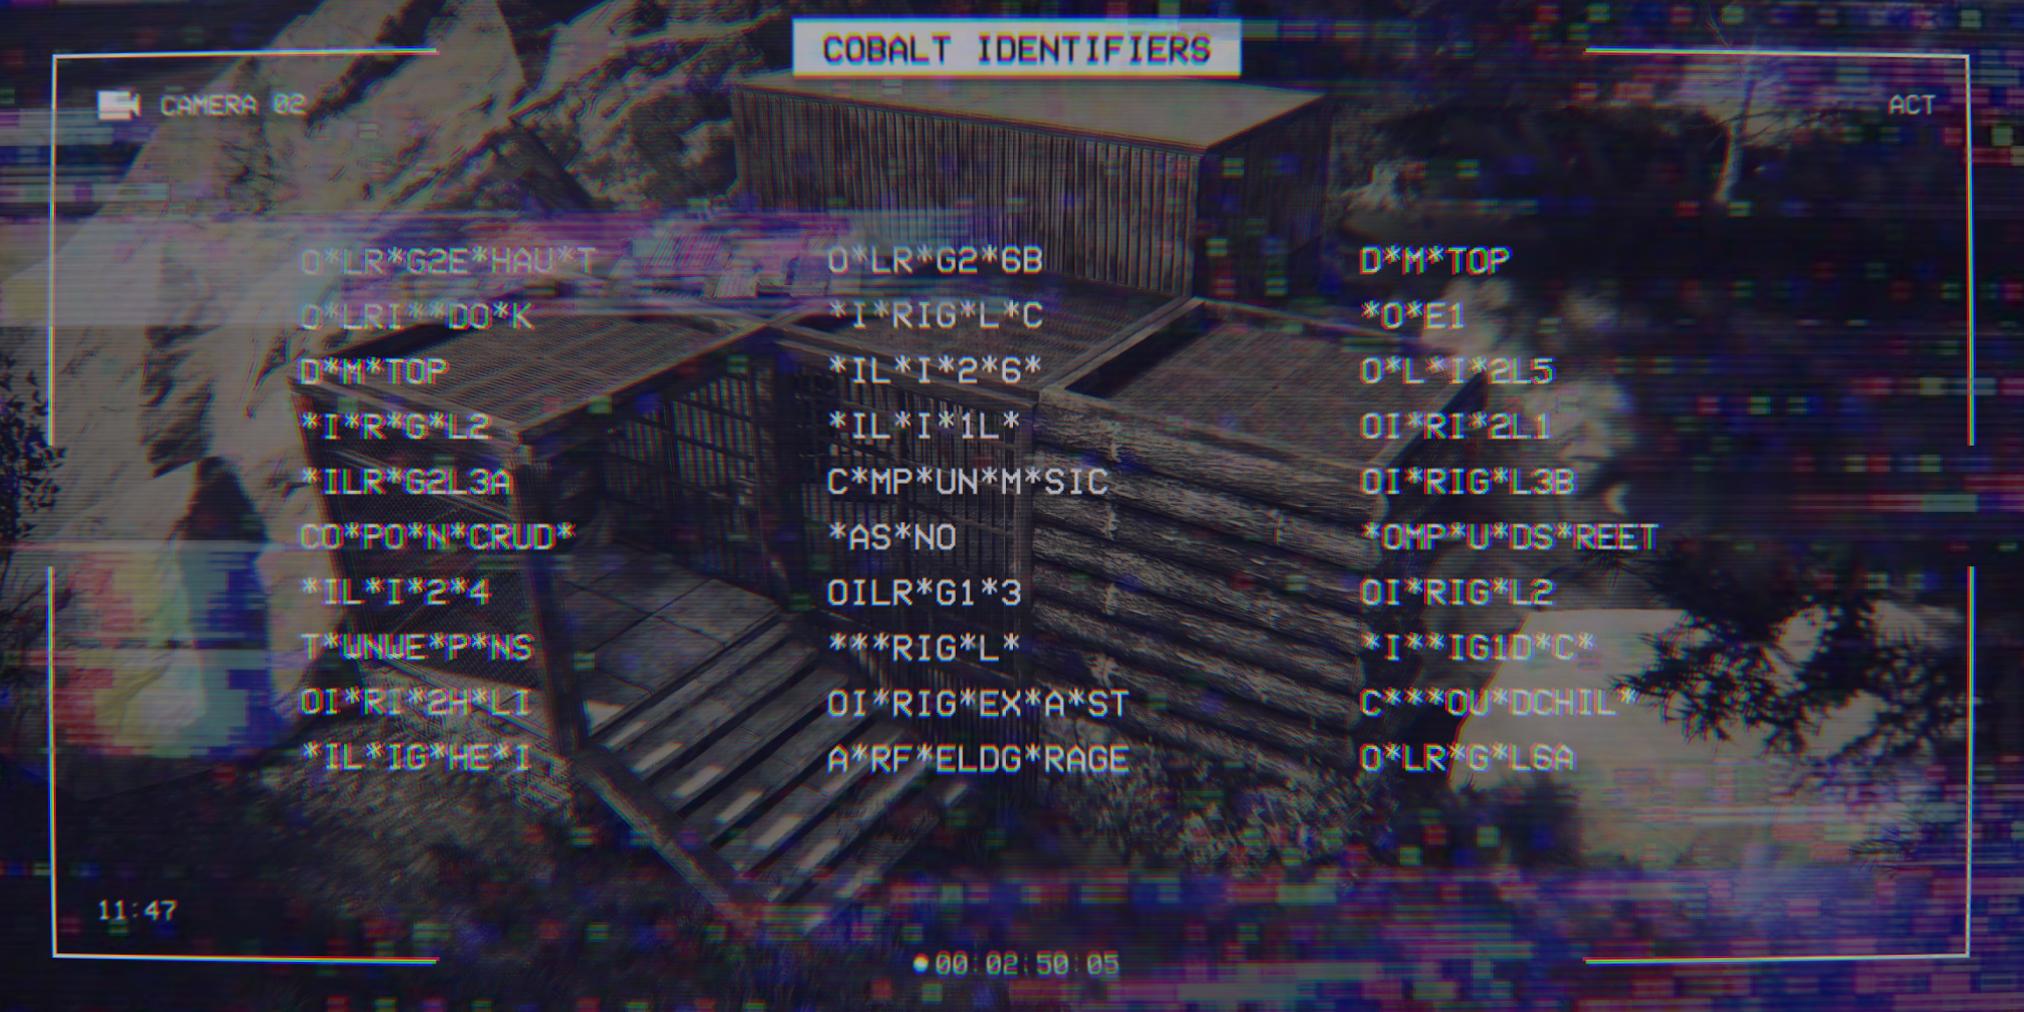 CCTV Update 4.png